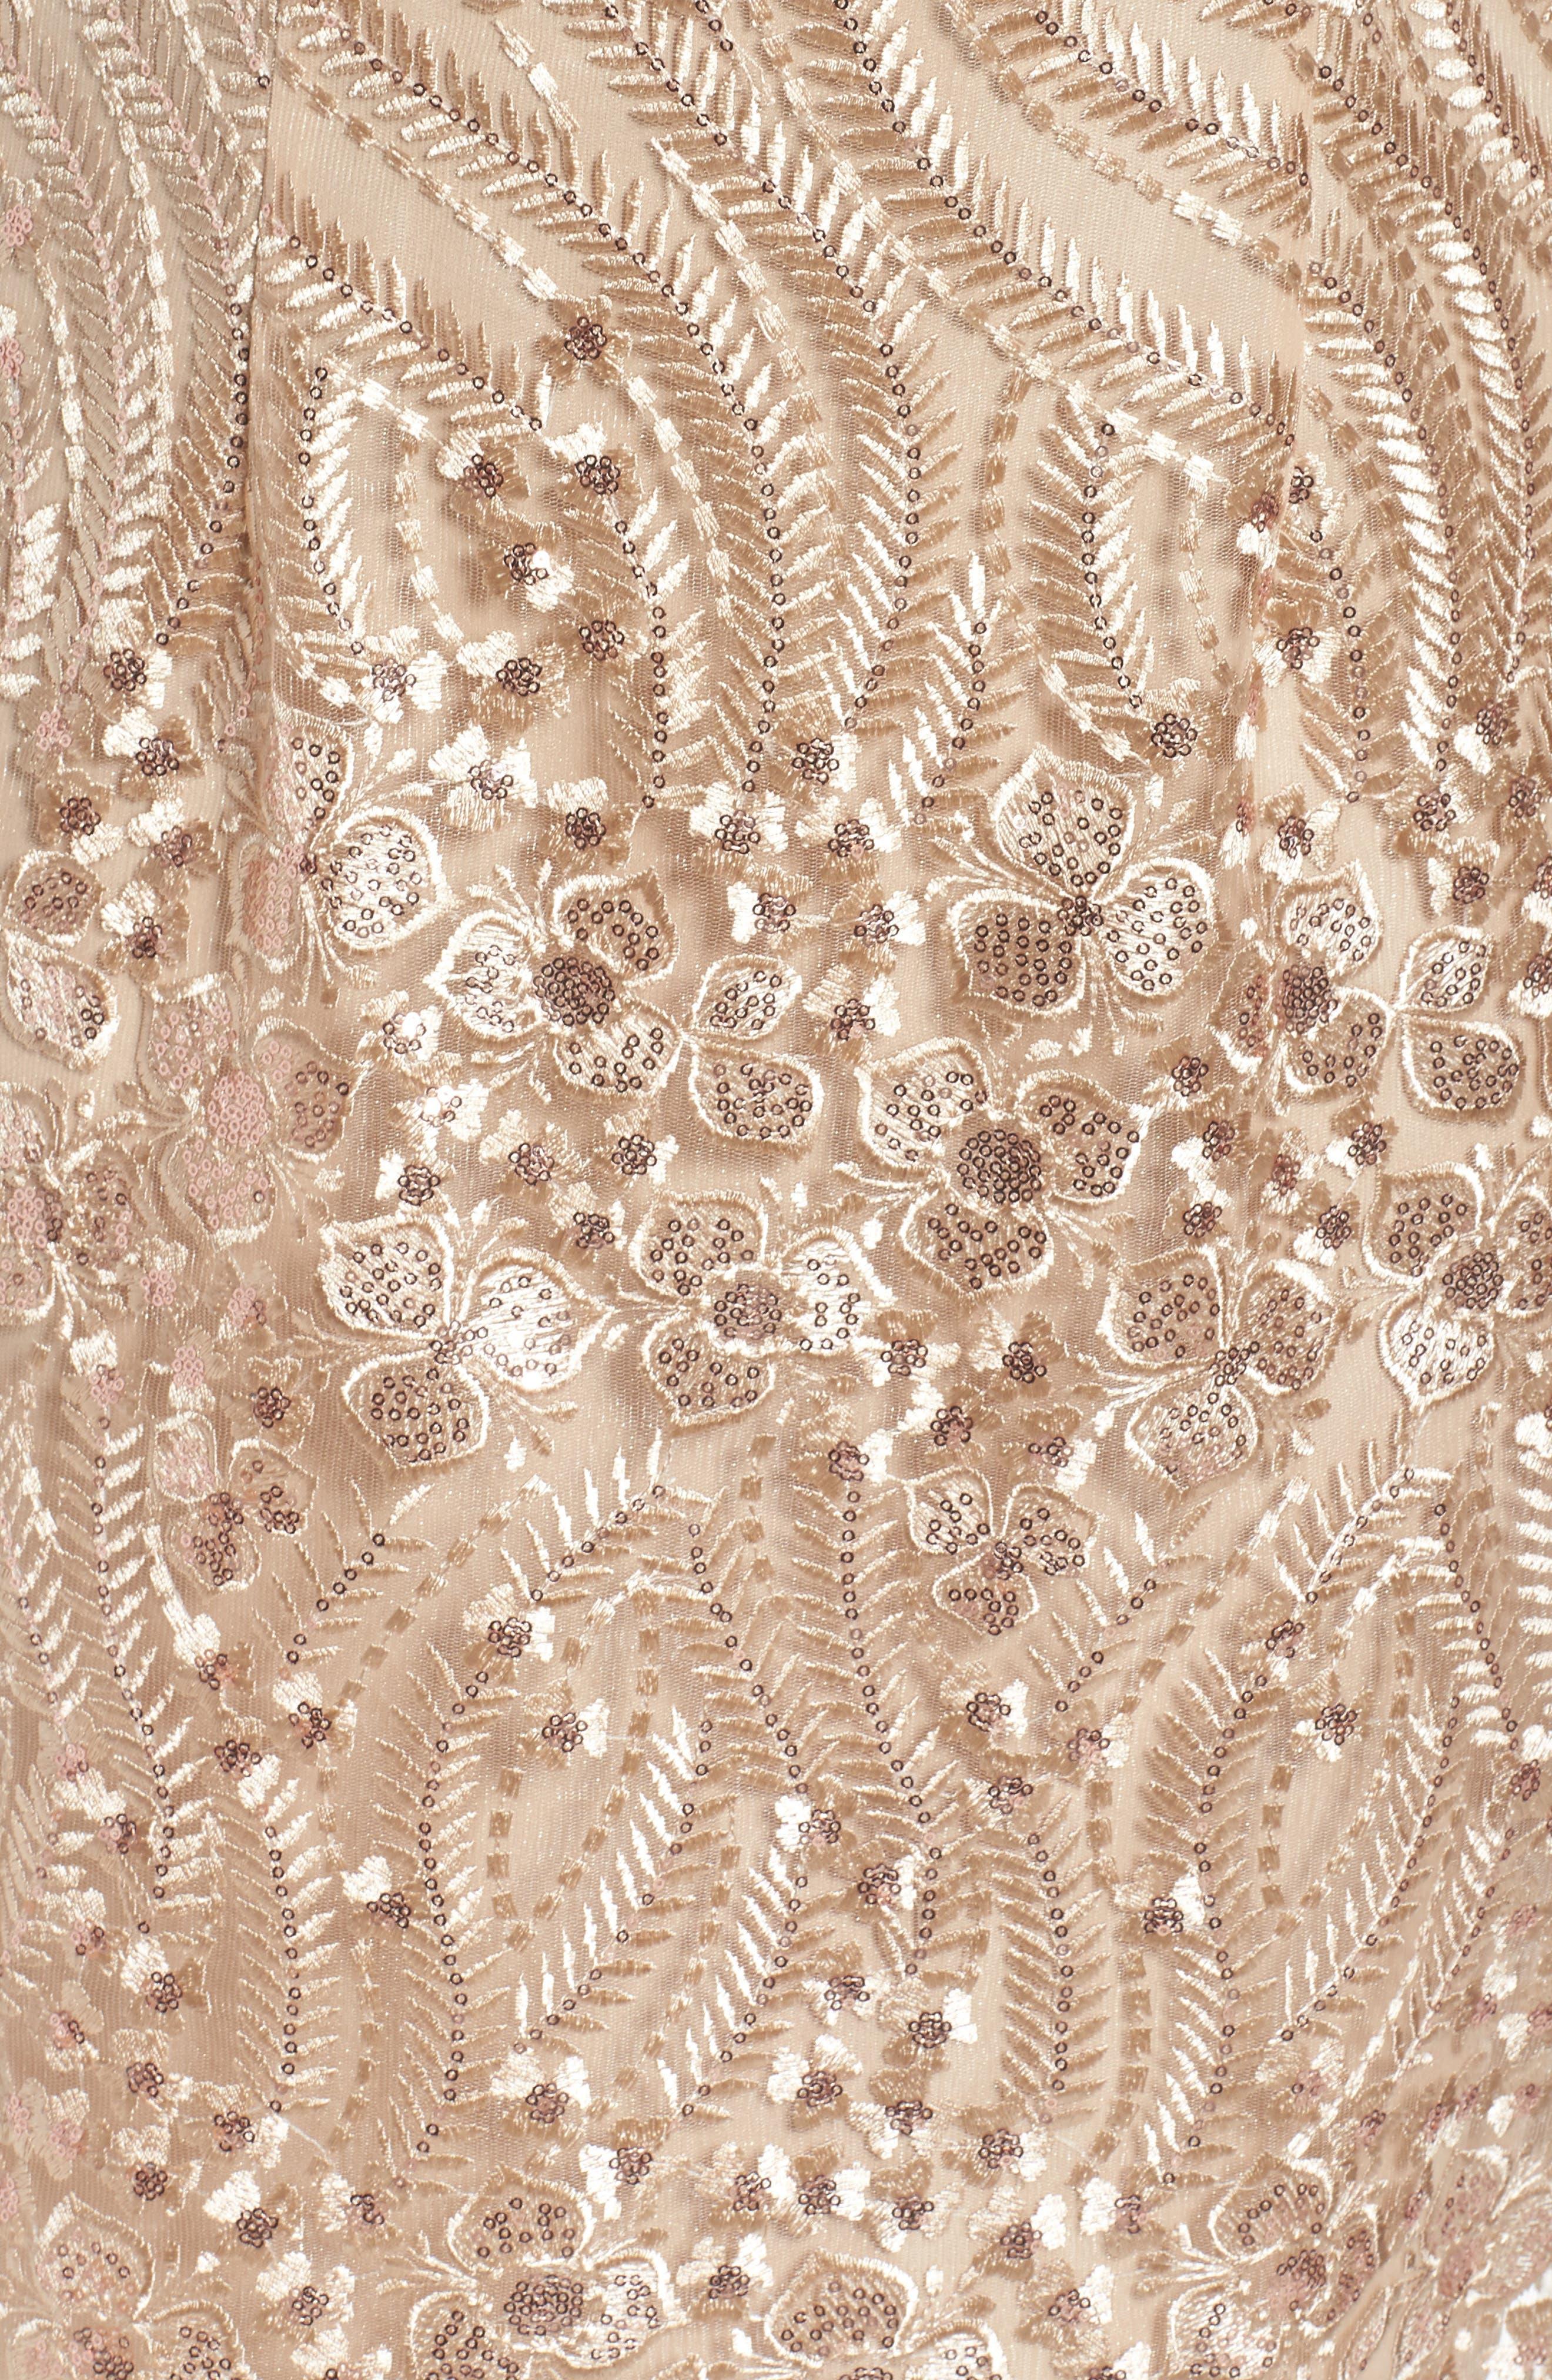 Embellished Sheath Dress,                             Alternate thumbnail 5, color,                             Champagne